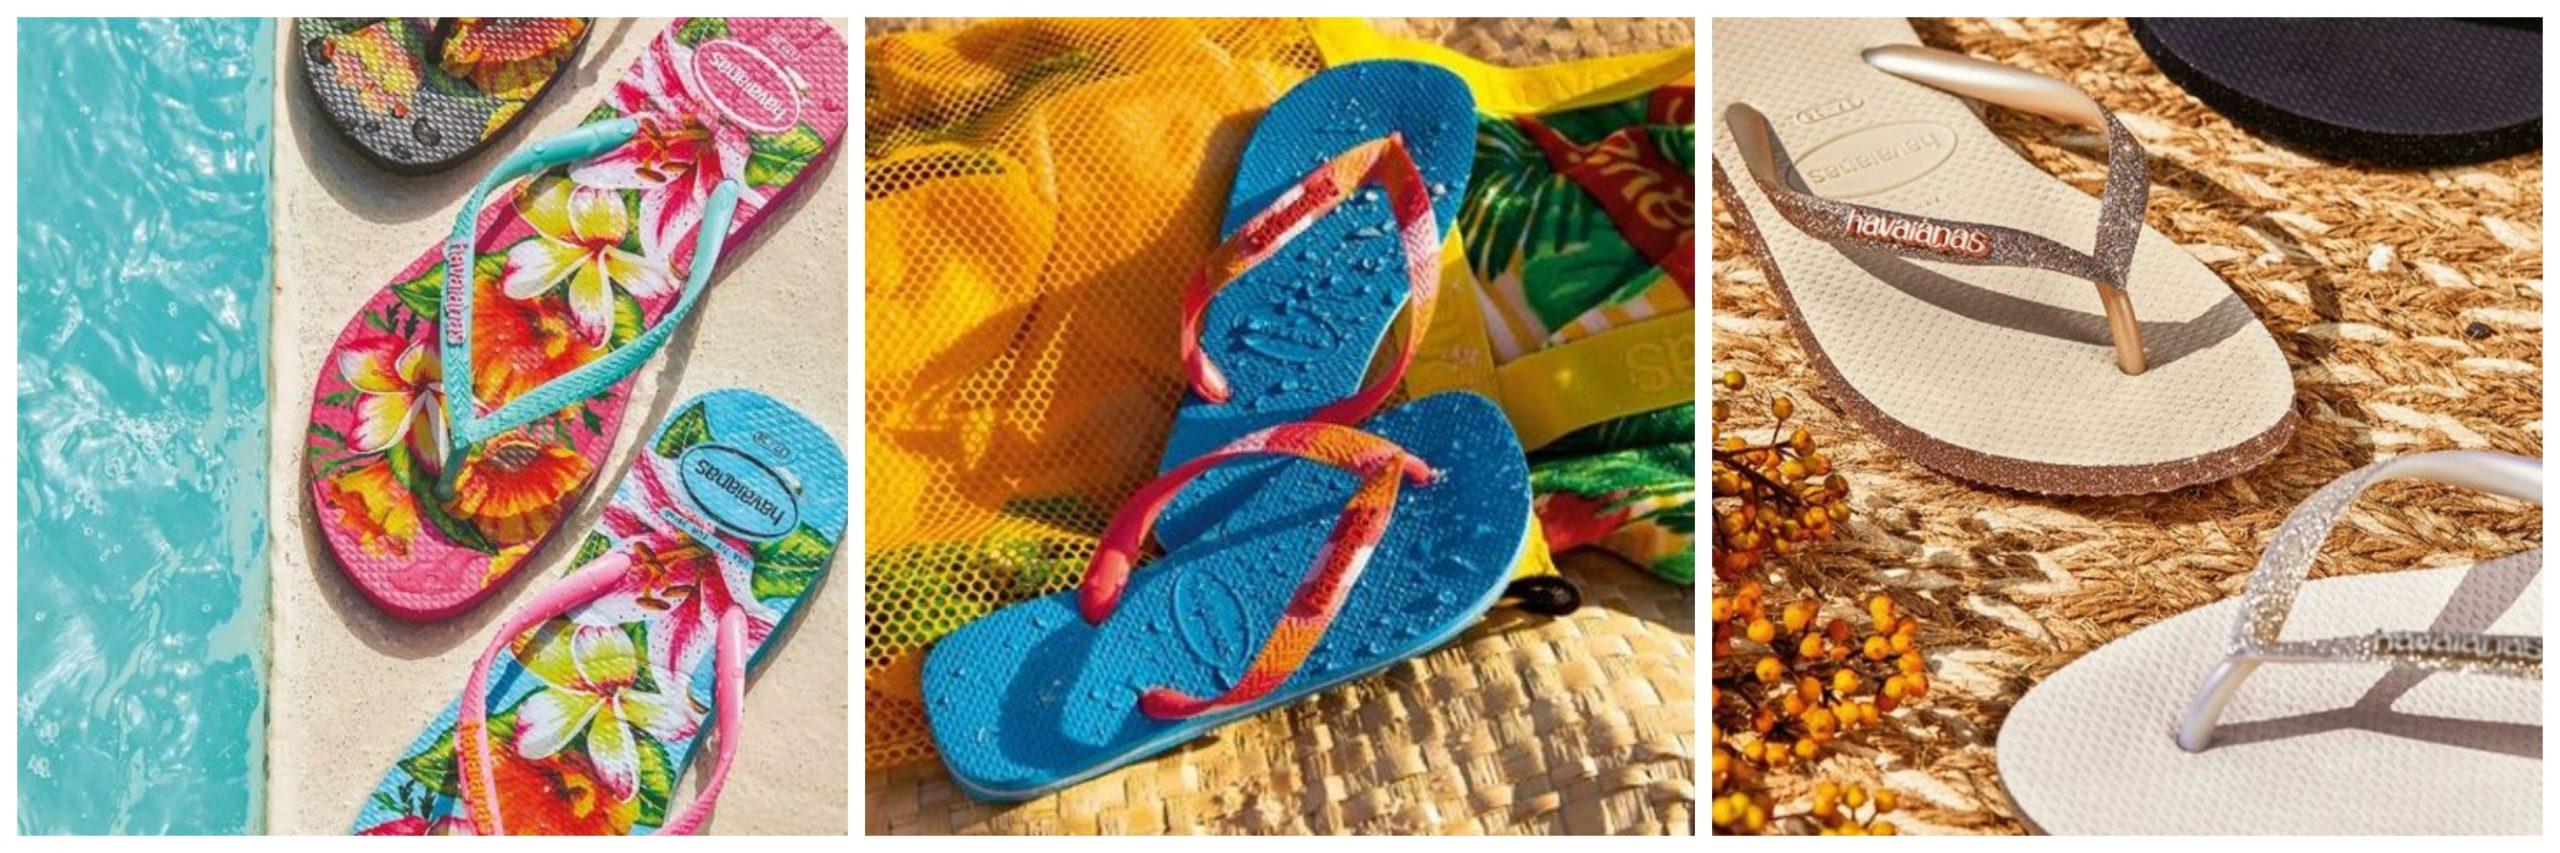 flip flop havaianas storia